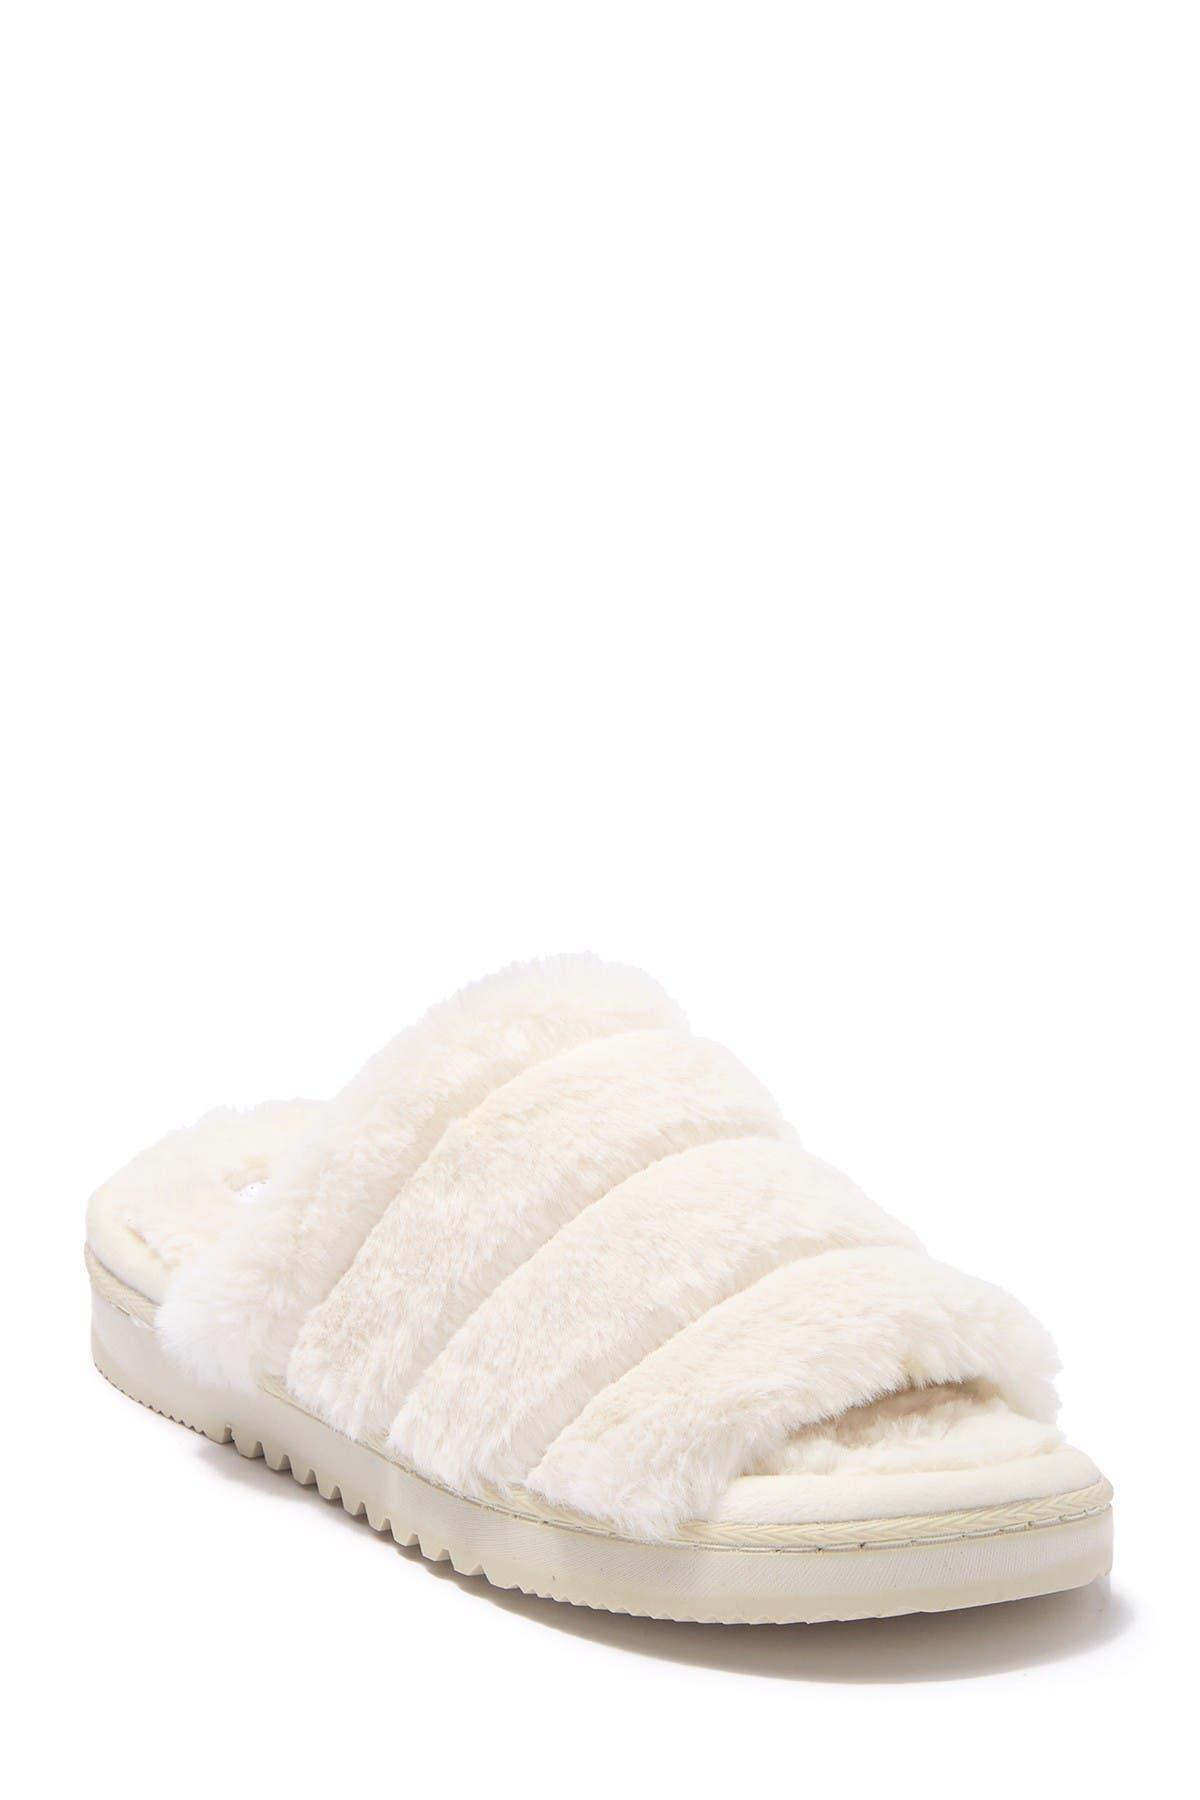 Image of Abound Wynter Faux Fur Slipper